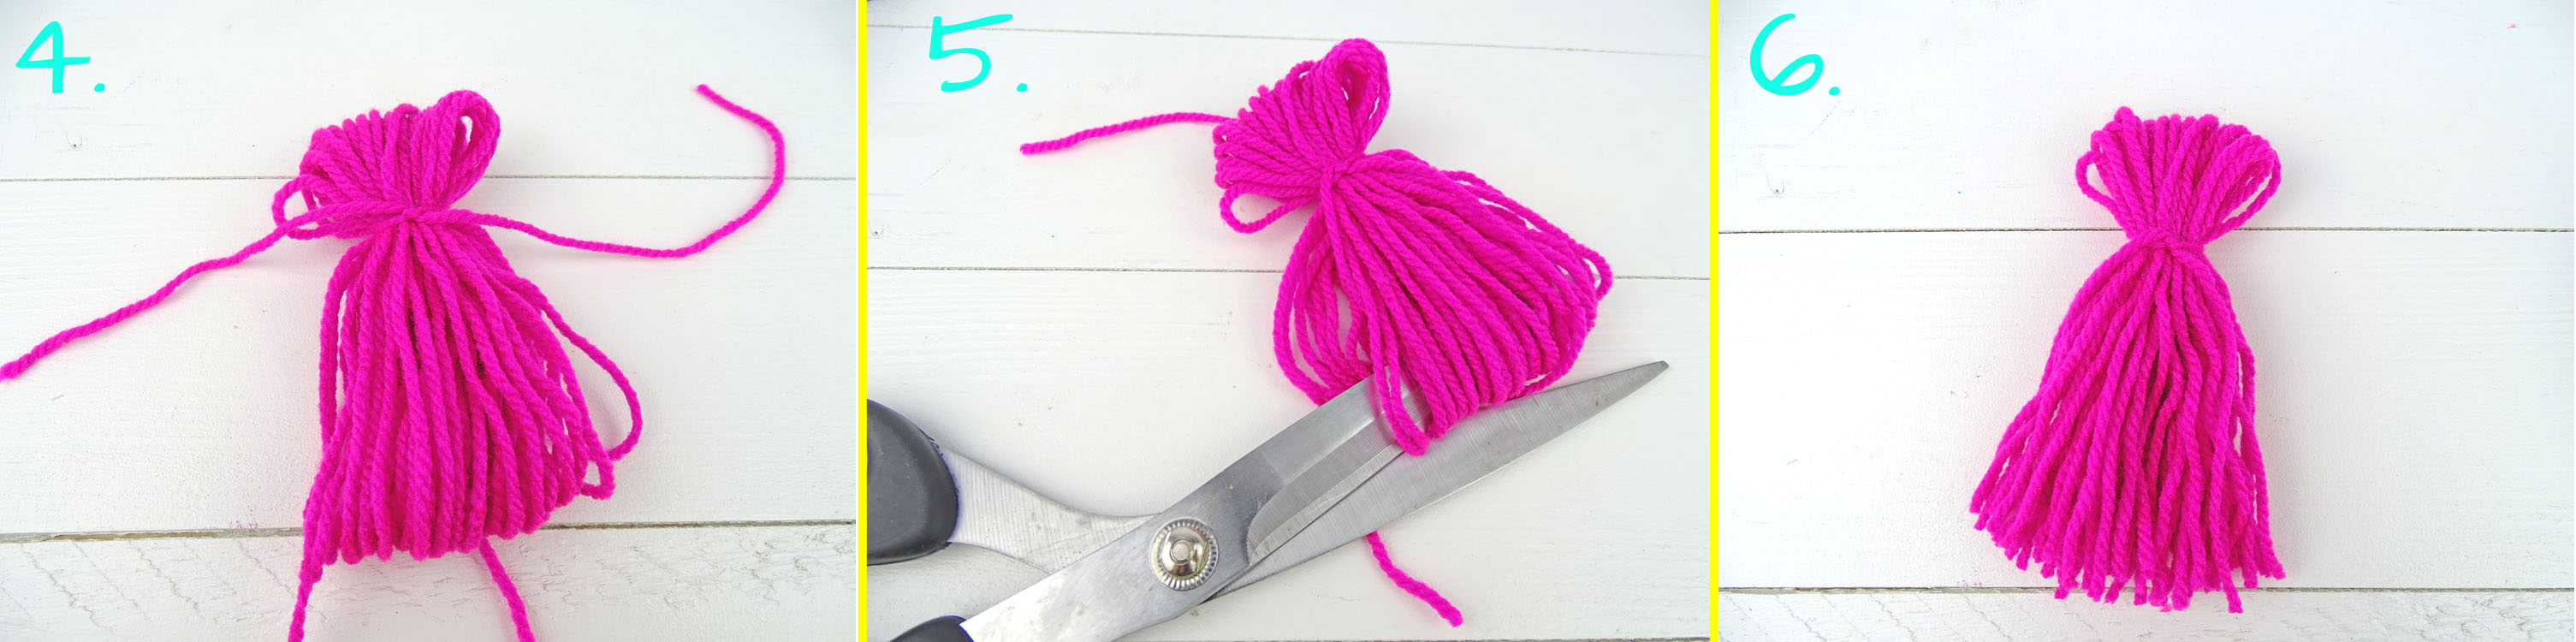 Anleitung 4-6 Tassel Girlande selbermachen DIY